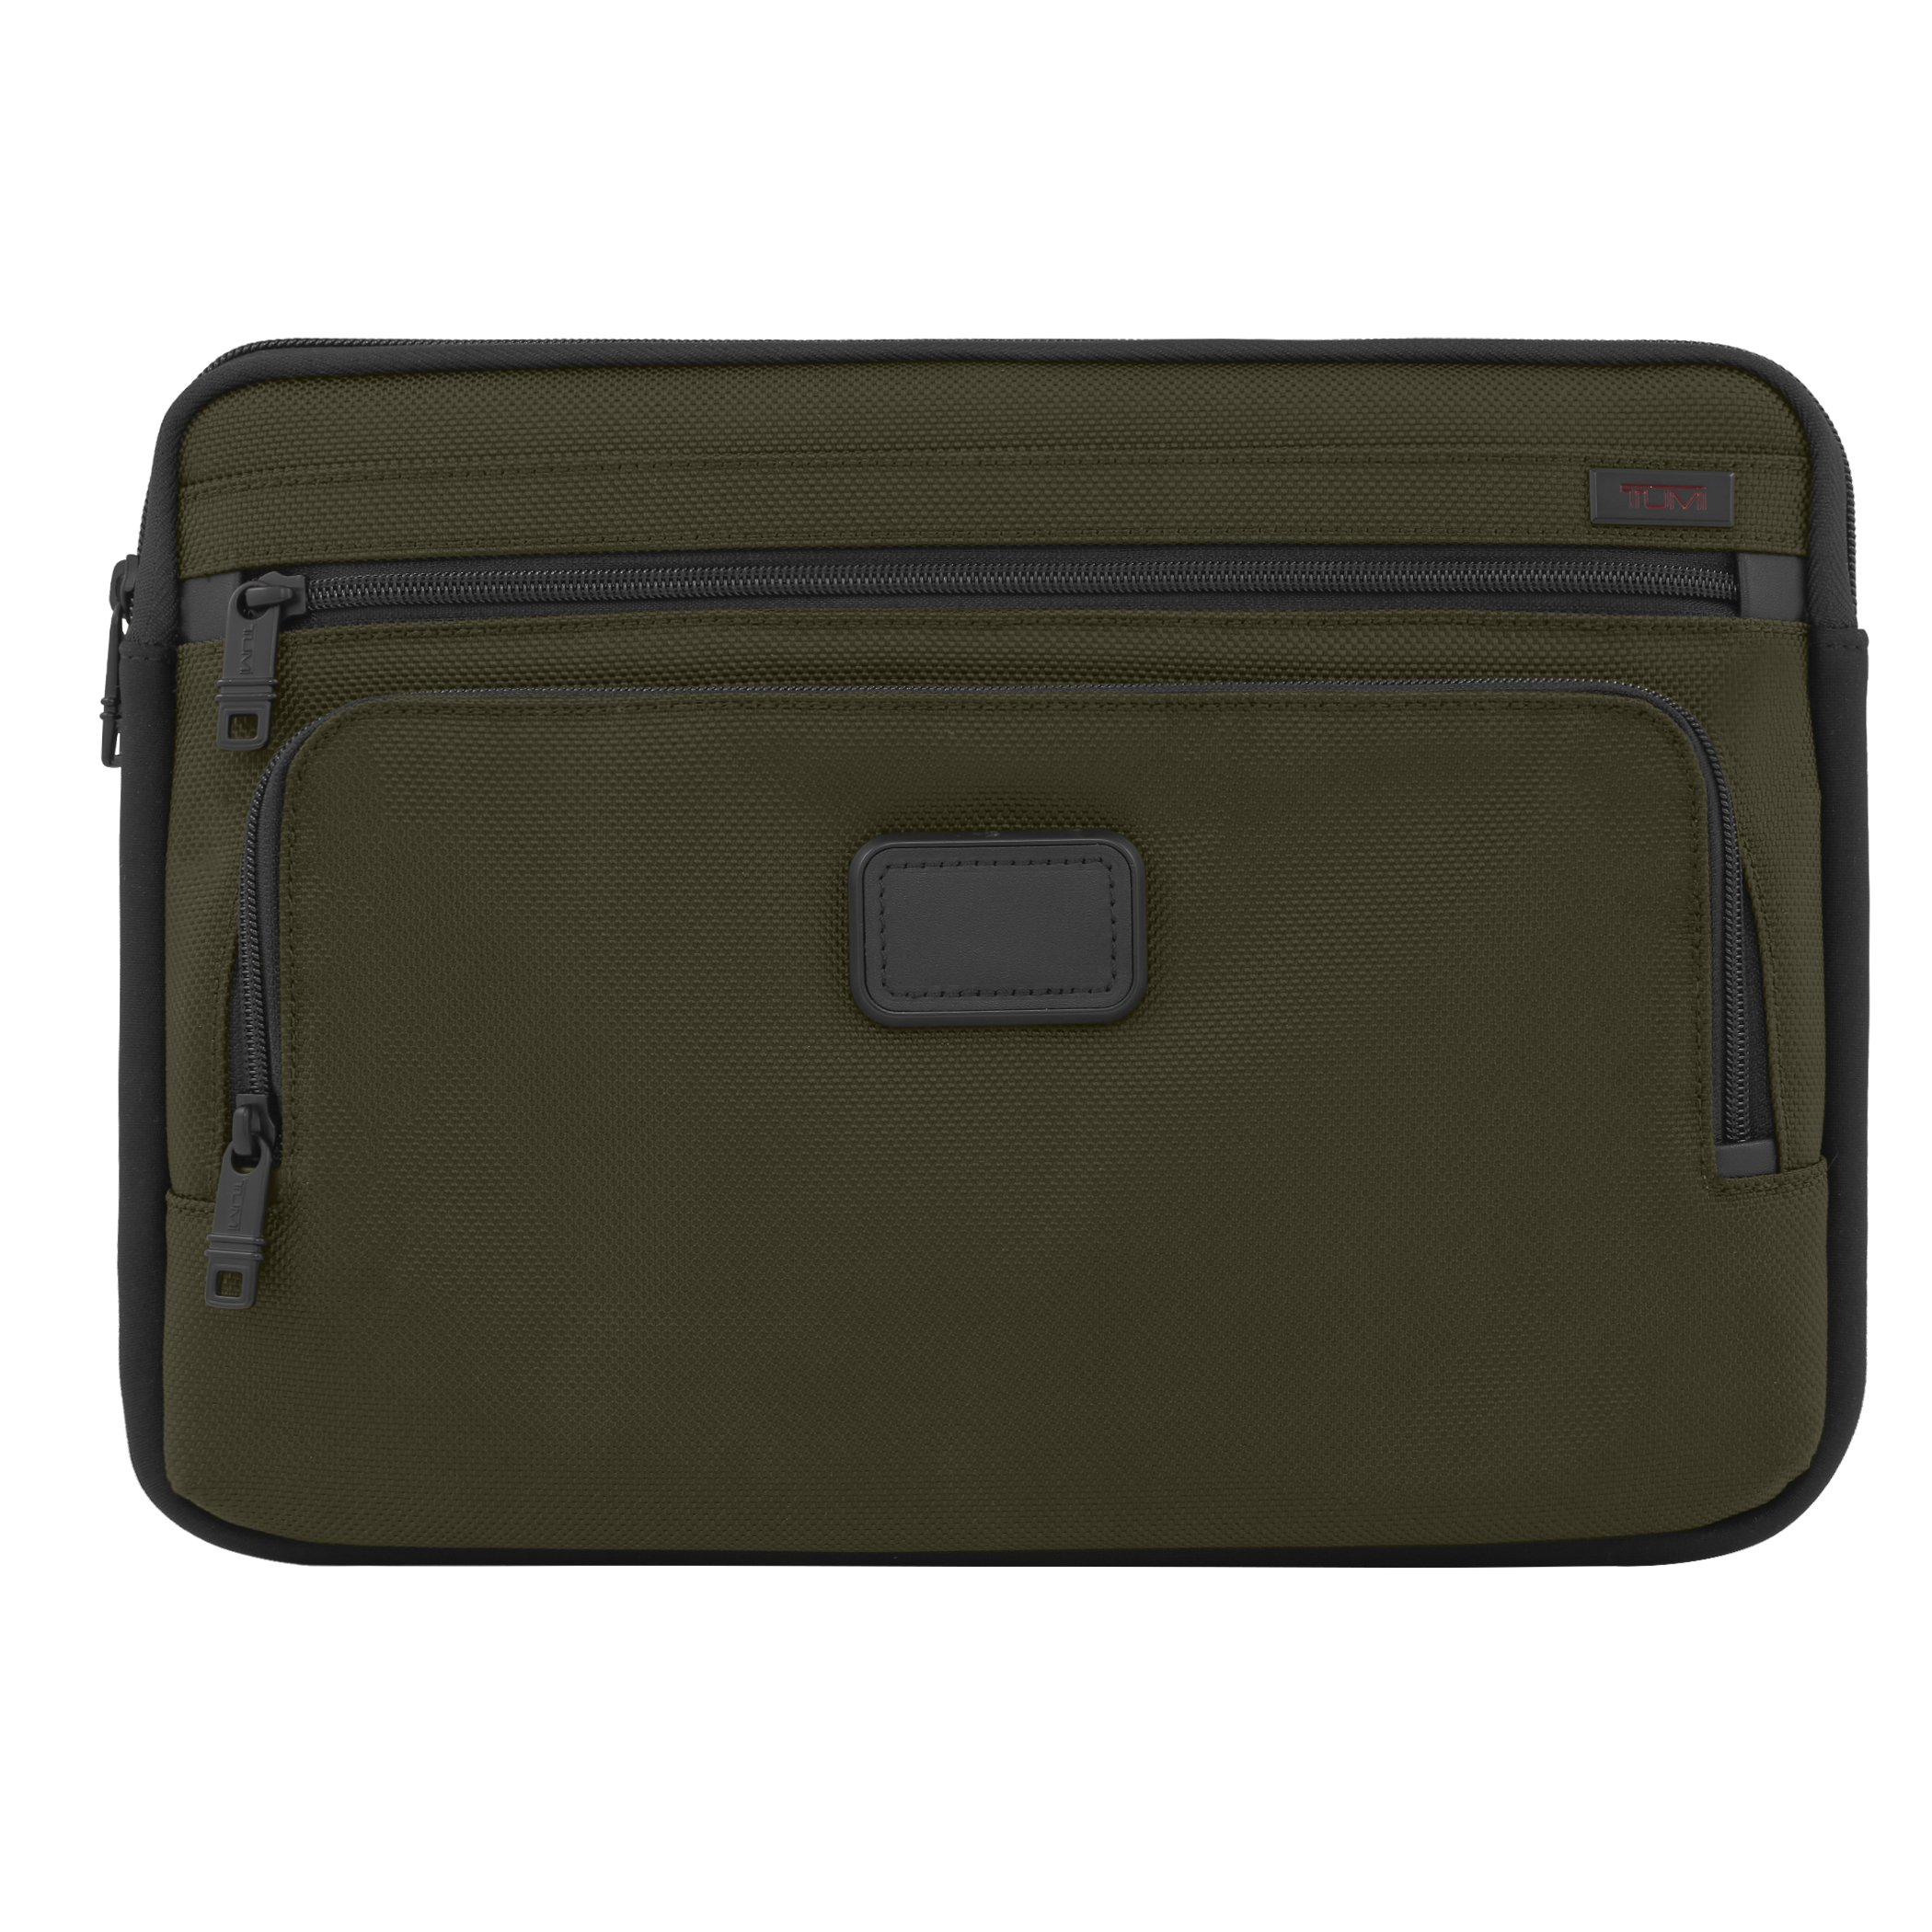 TUMI Laptop Cover for 13'' Laptops - Ballistic Nylon Olive